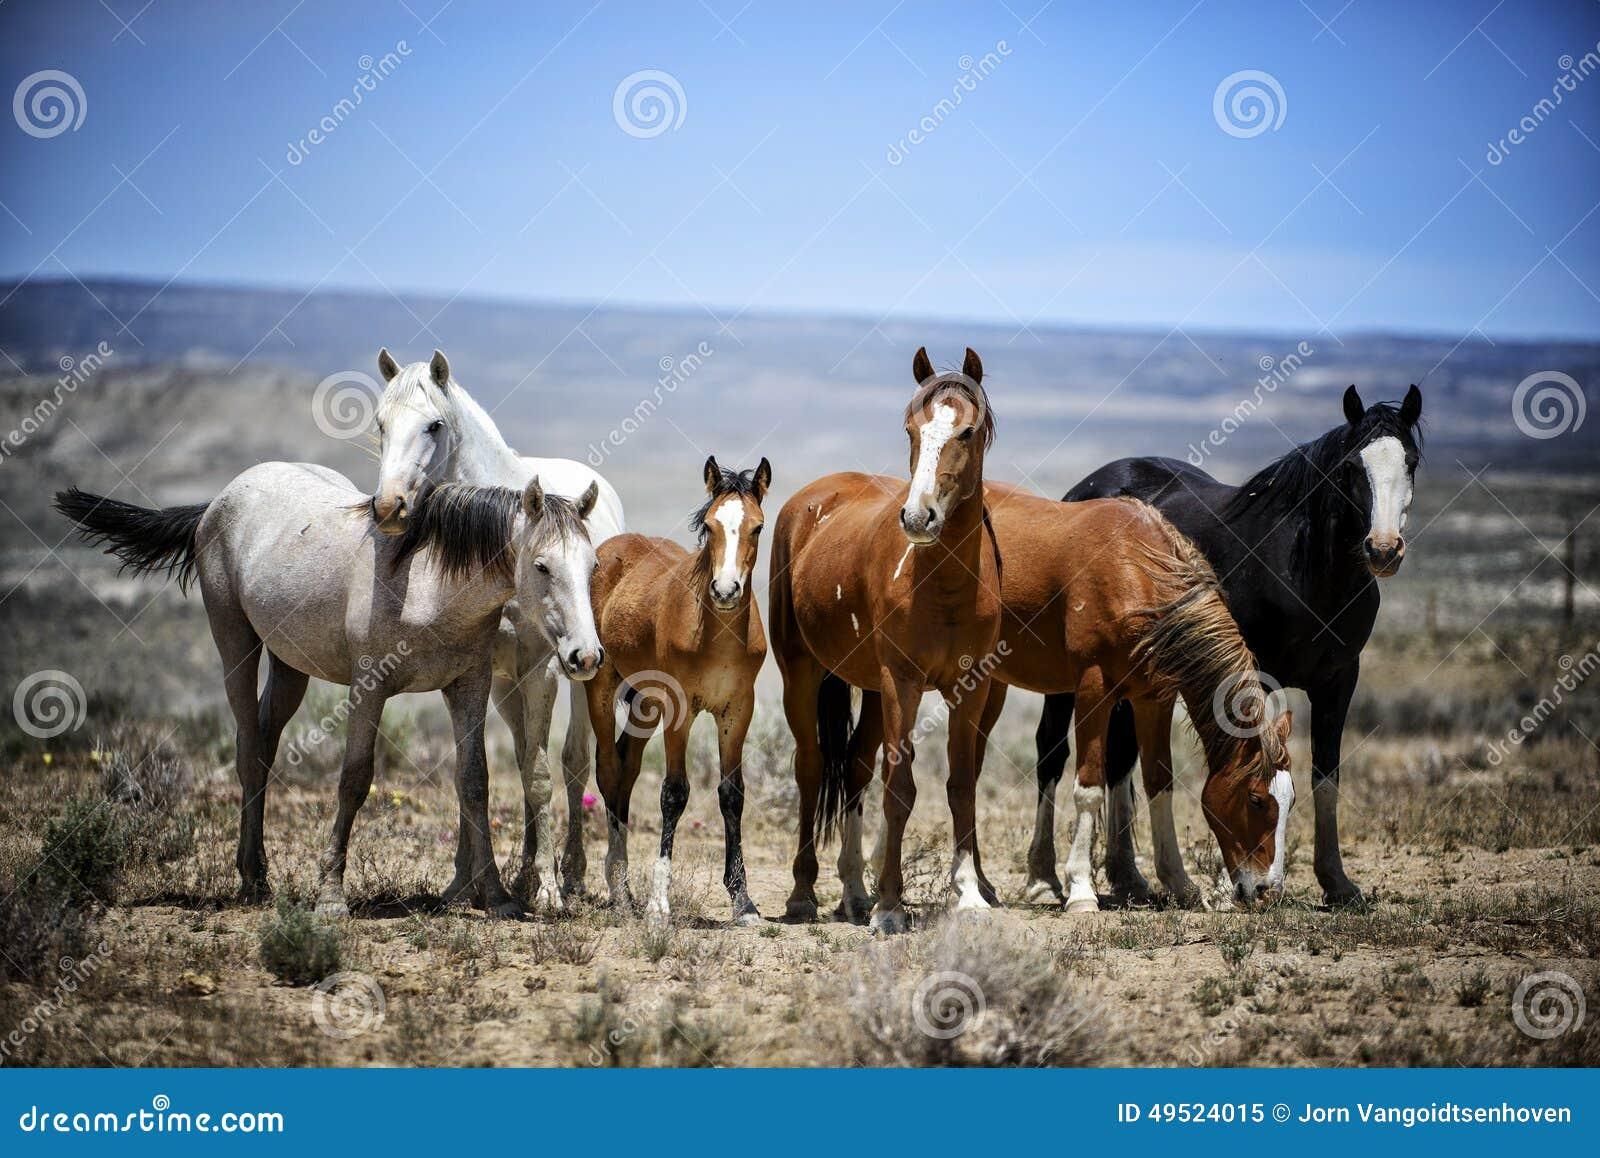 Retrato de la banda del caballo salvaje del lavabo de la arena